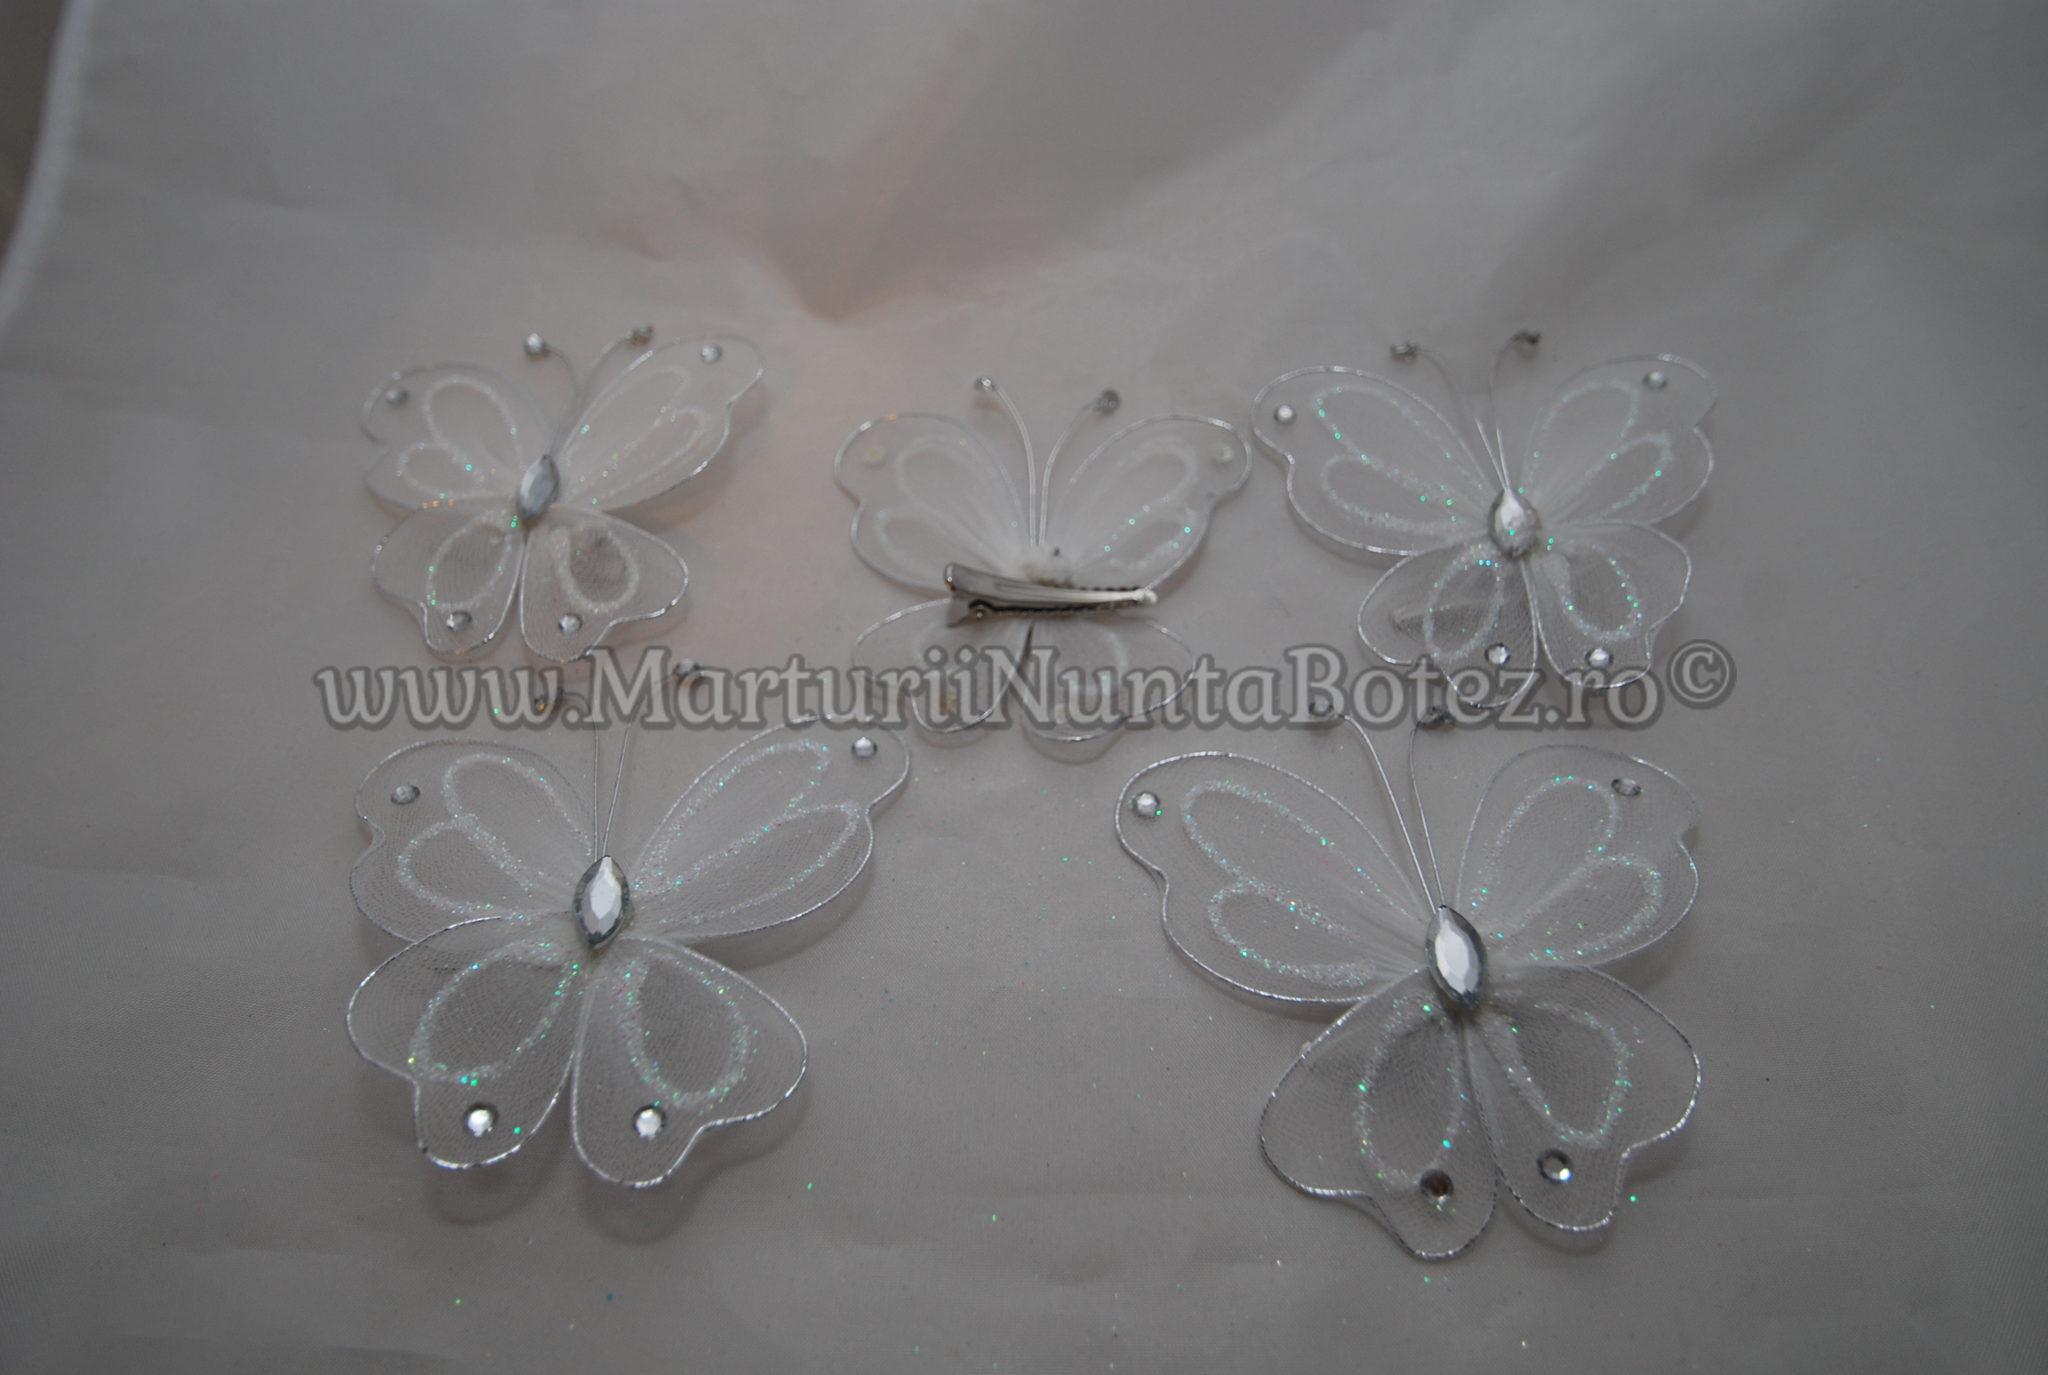 2Marturii_decorative_deco_fluture_fluturi_decorativi_roz_albastru_alb_crem13